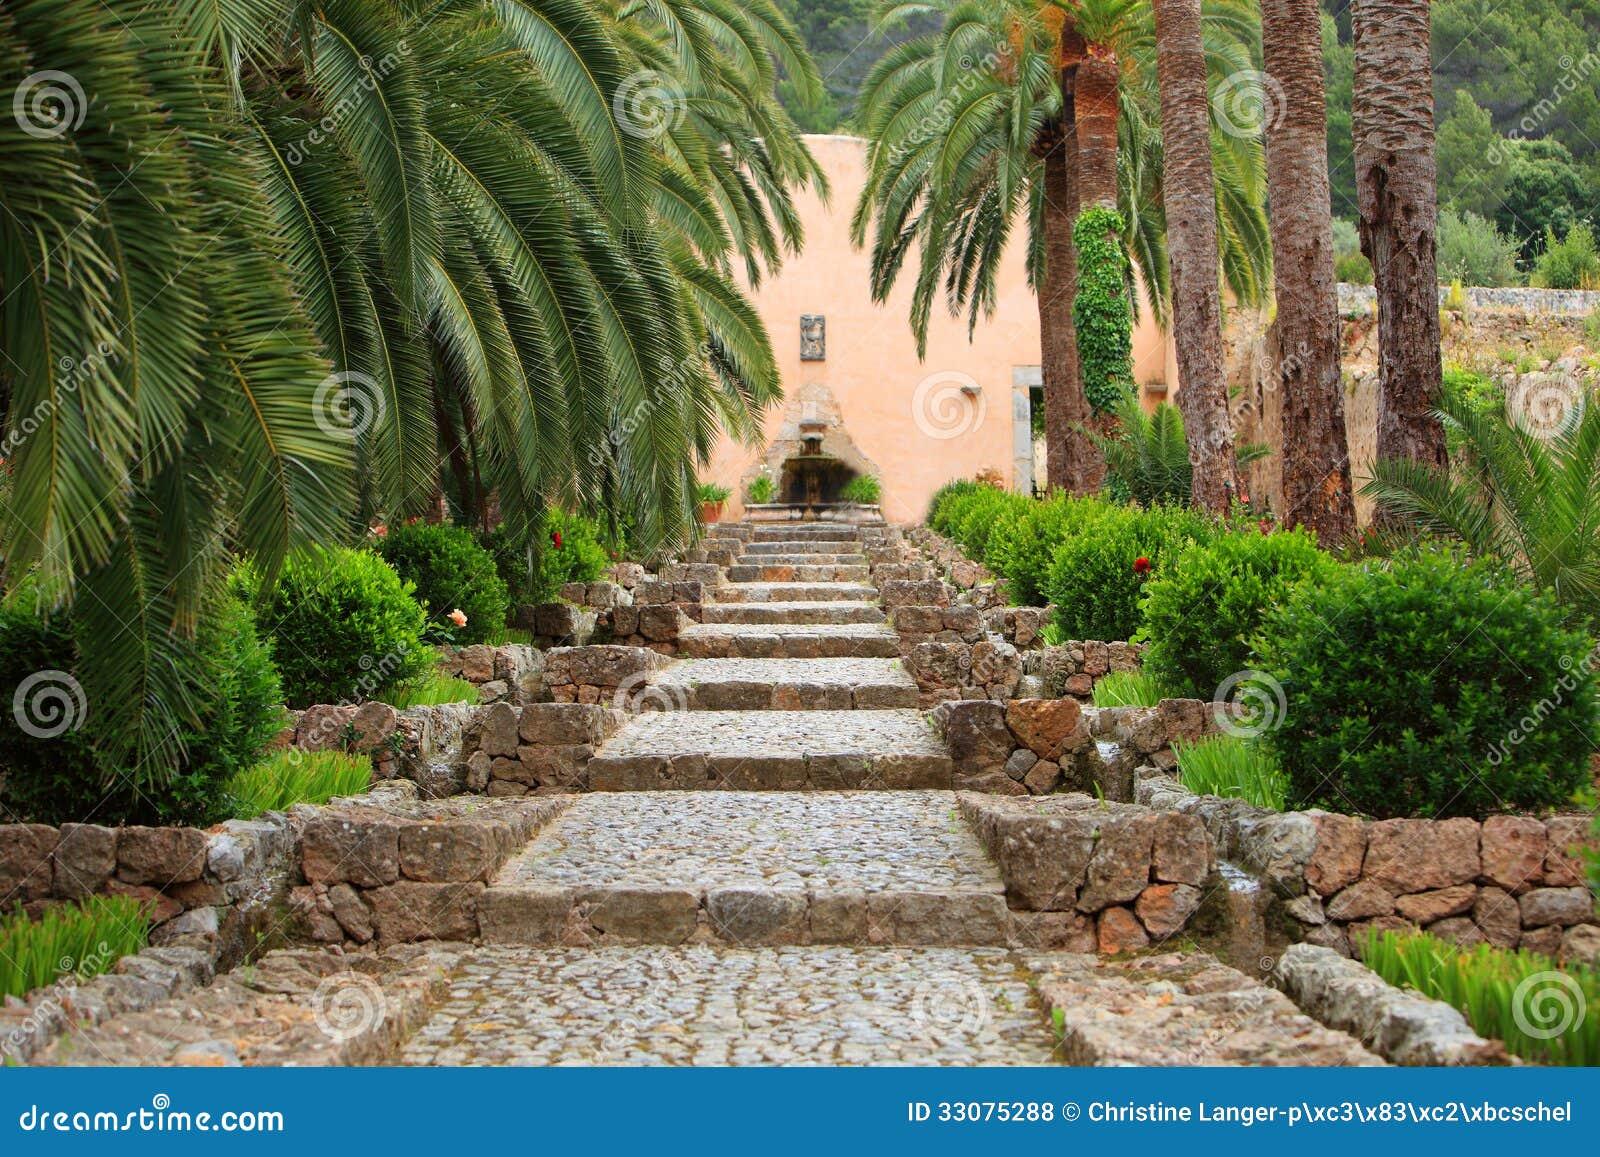 Straight Garden Walkway With Cobblestones Royalty Free Stock ...